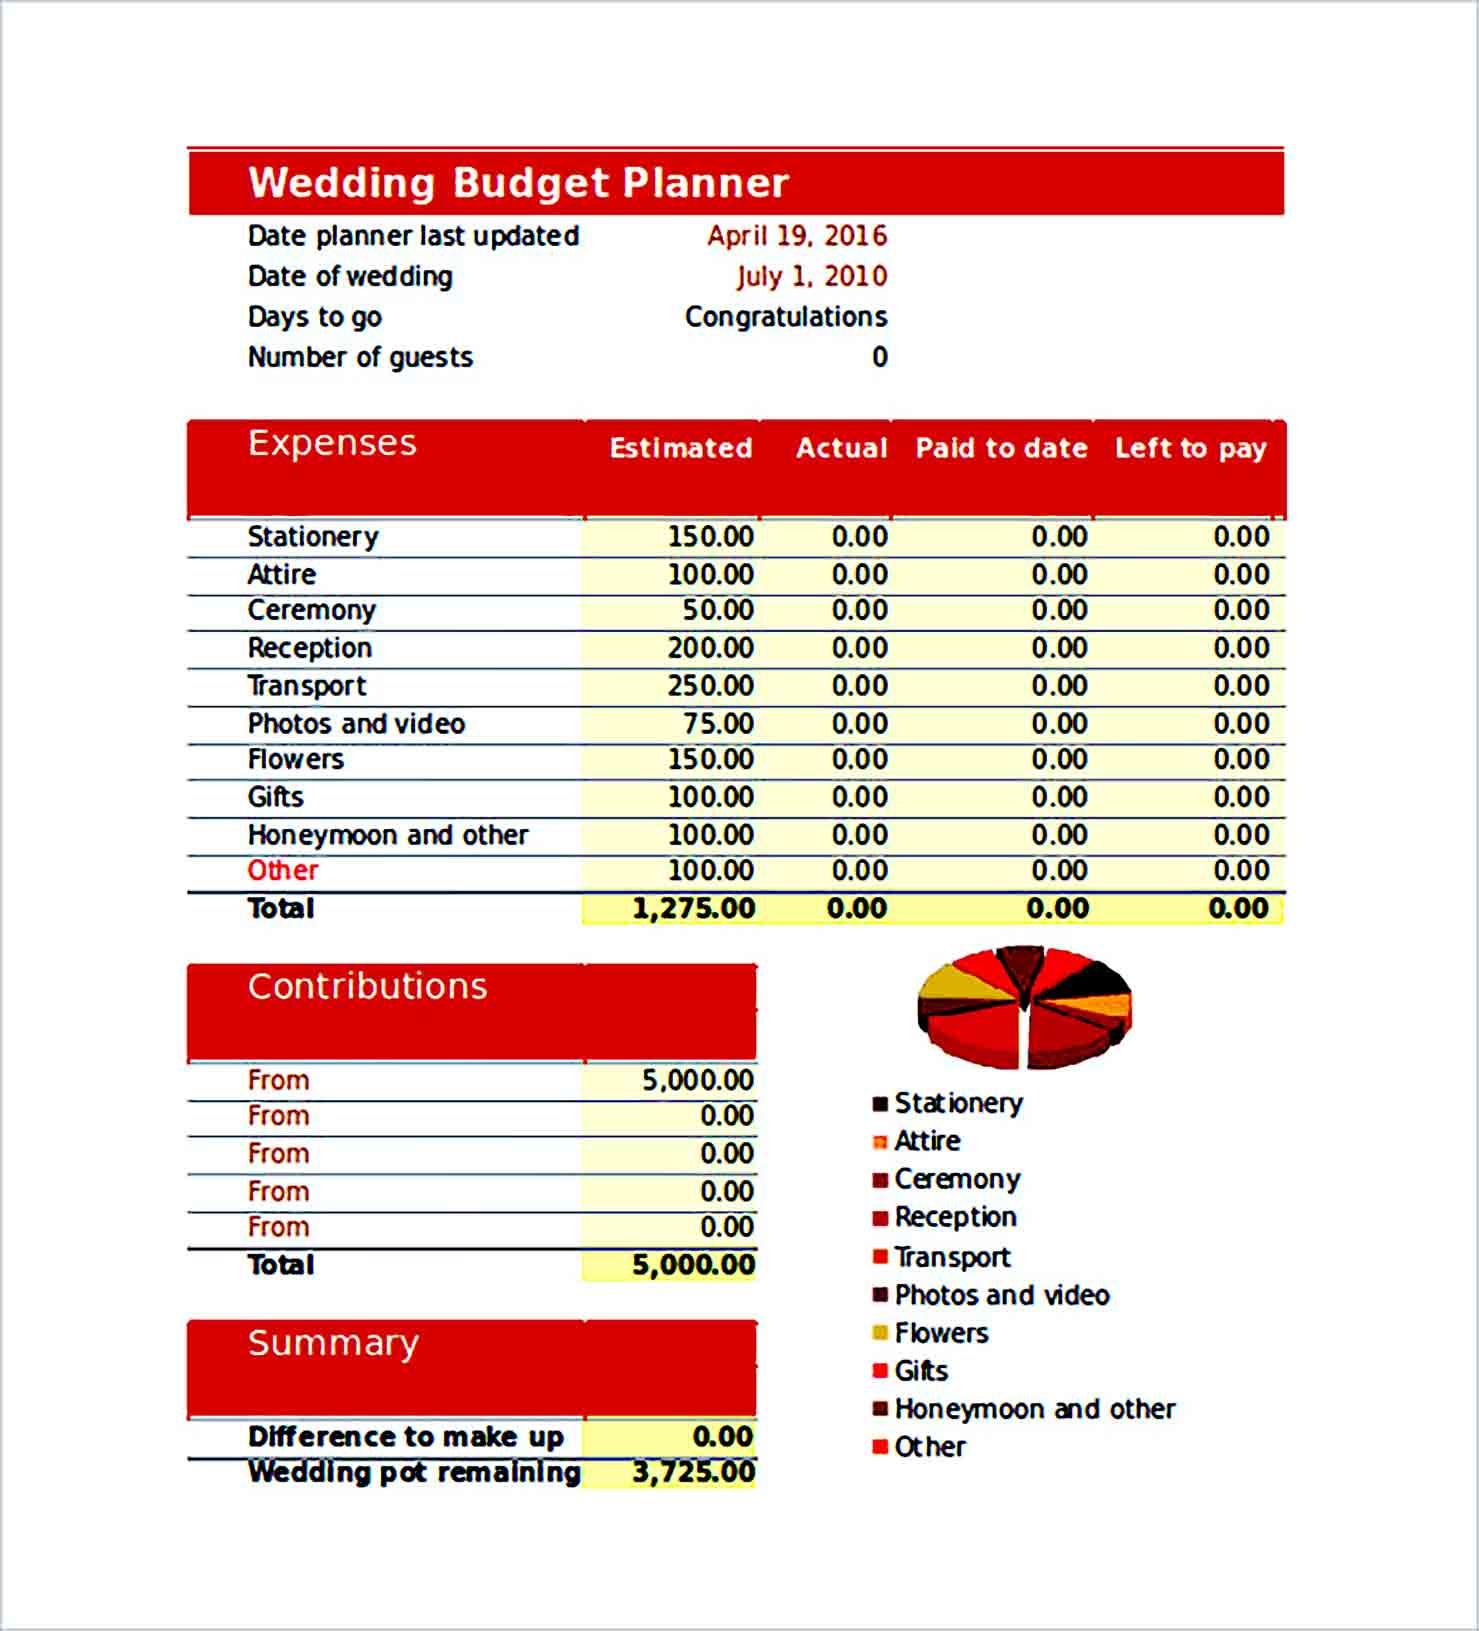 Sample Wedding Budget Planer